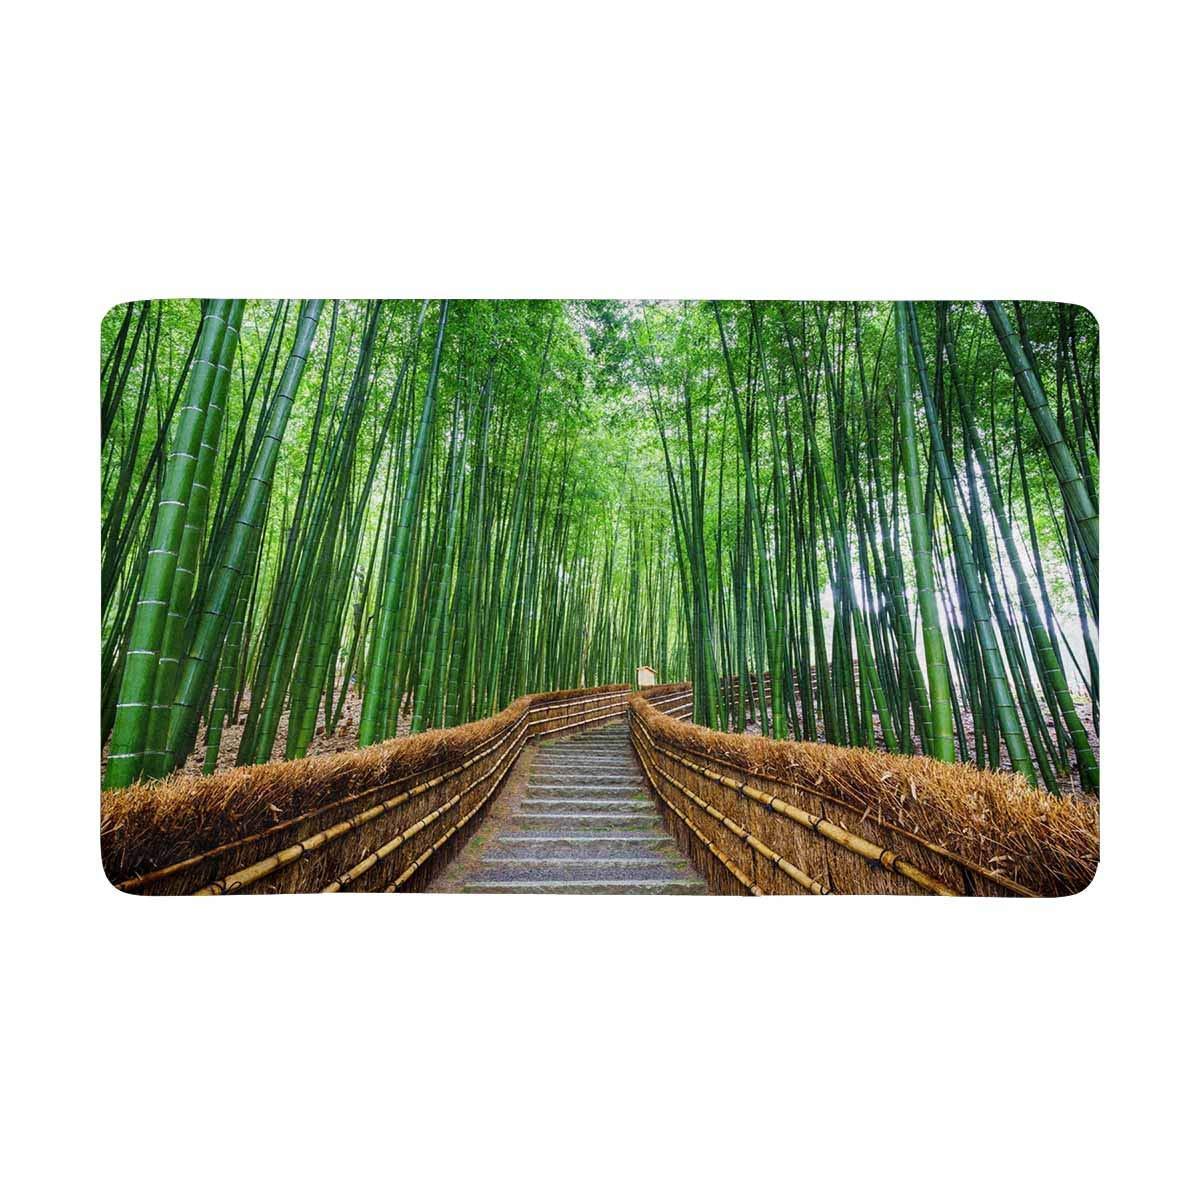 Camino al bosque de bambú, Arashiyama, Tokio, Japón alfombra de entrada interior felpudo rascador de zapatos